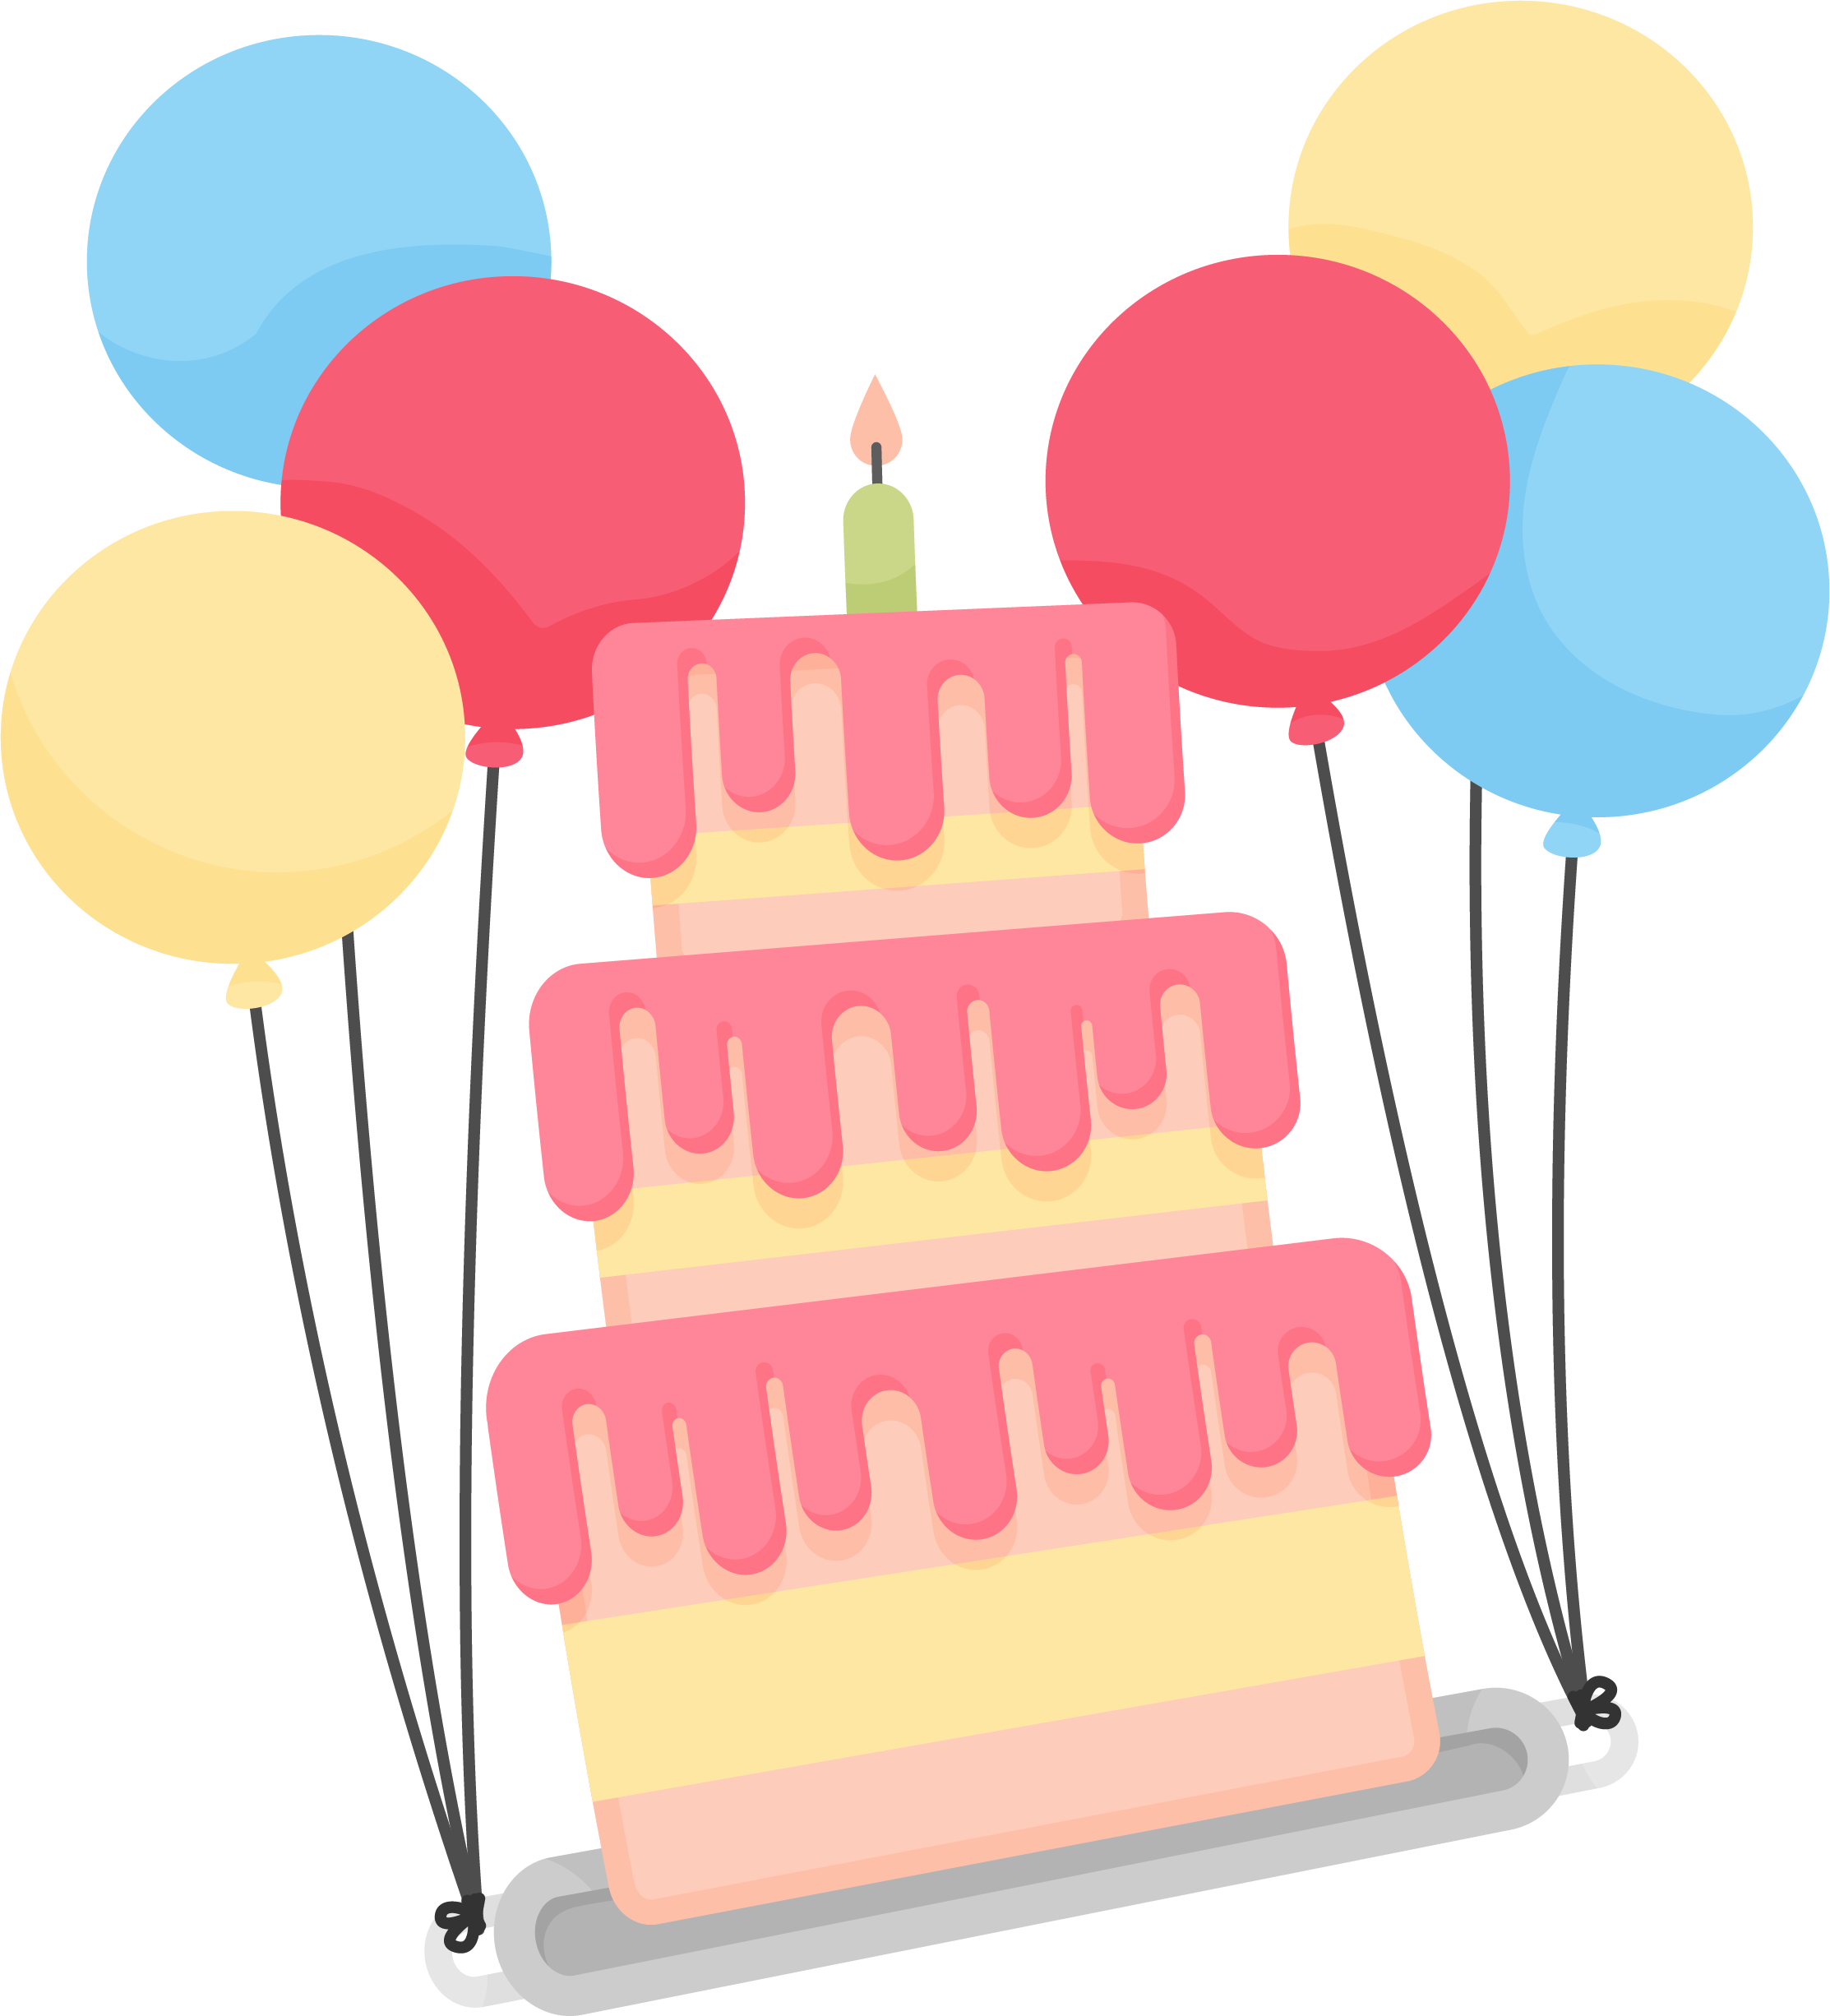 Torta clip art decoration. Clipart balloon birthday cake